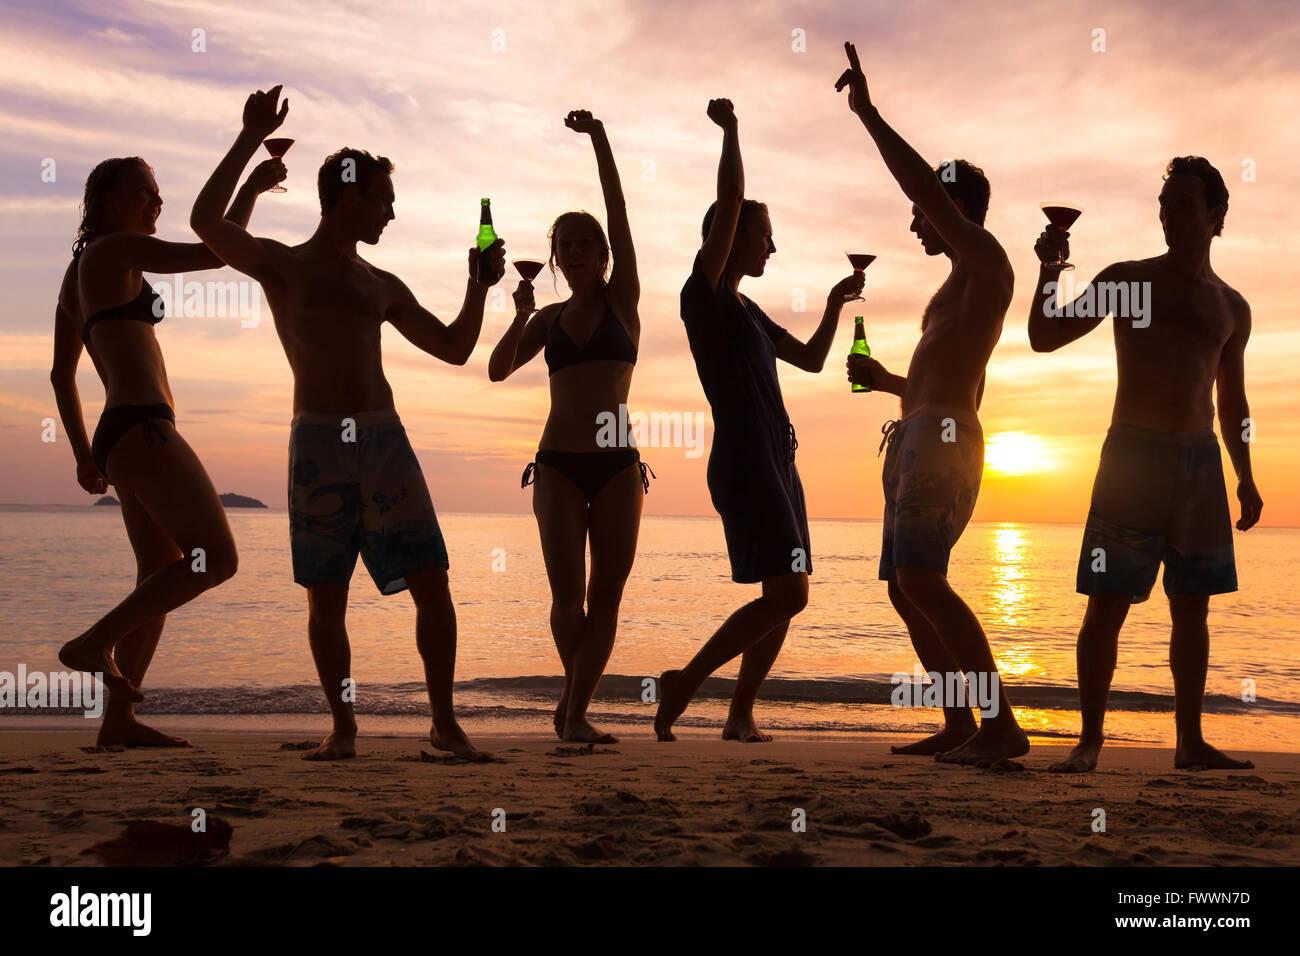 Group Of People Dancing 107